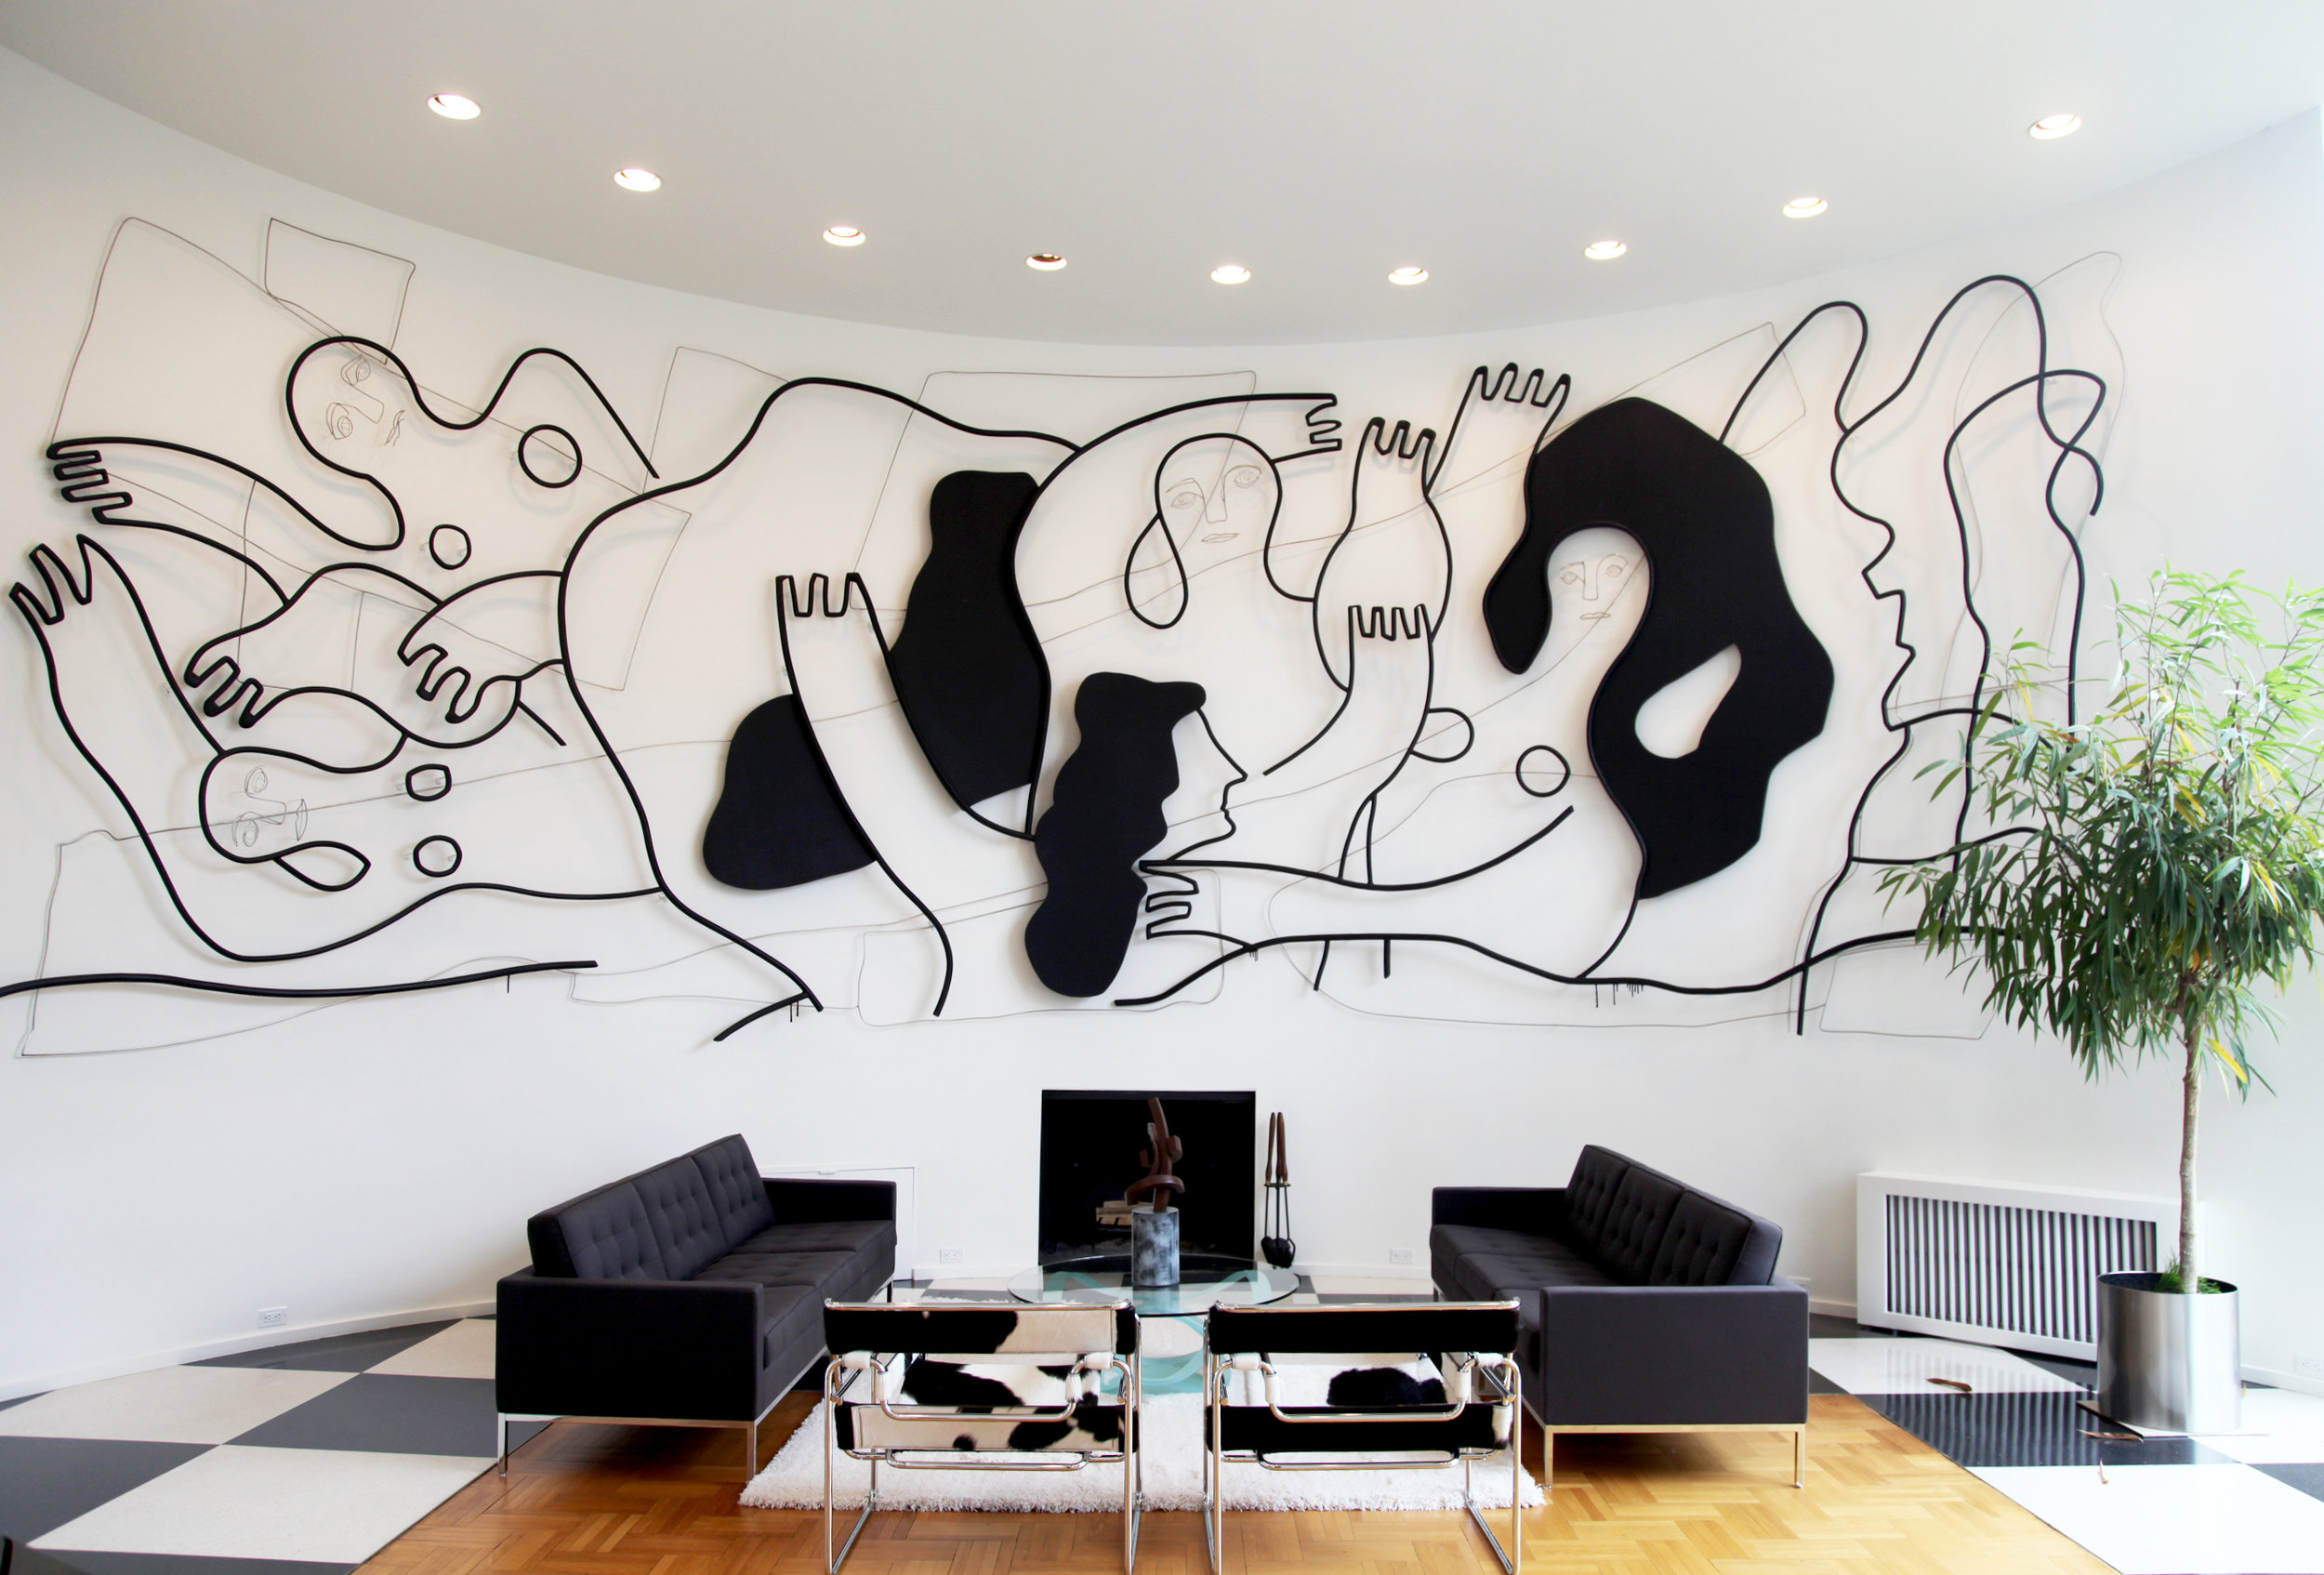 brandon d'leo installation new york city